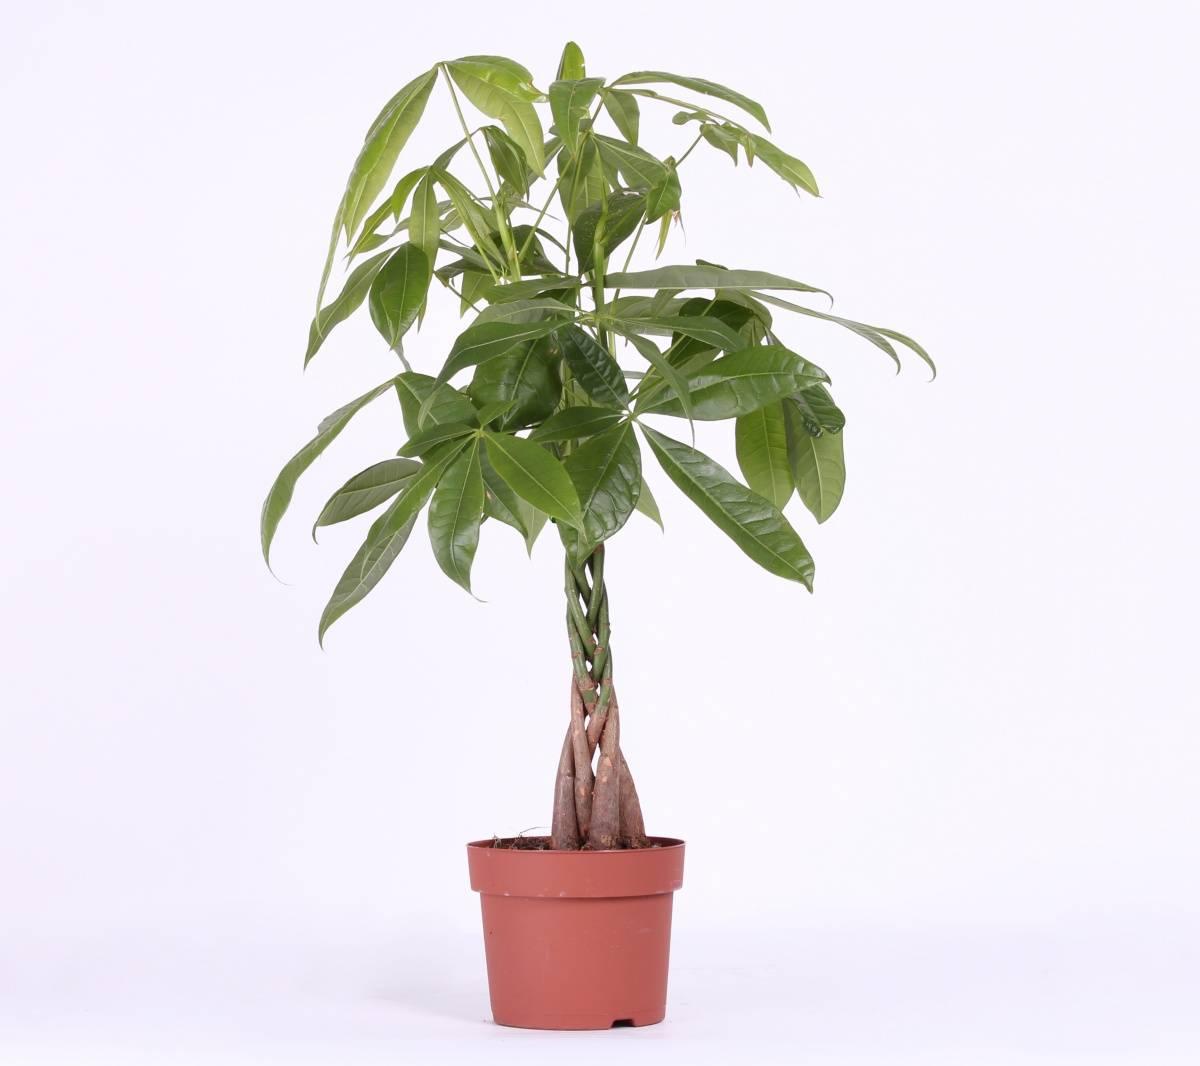 Комнатное растение пахира: фото, уход и размножение в домашних условиях